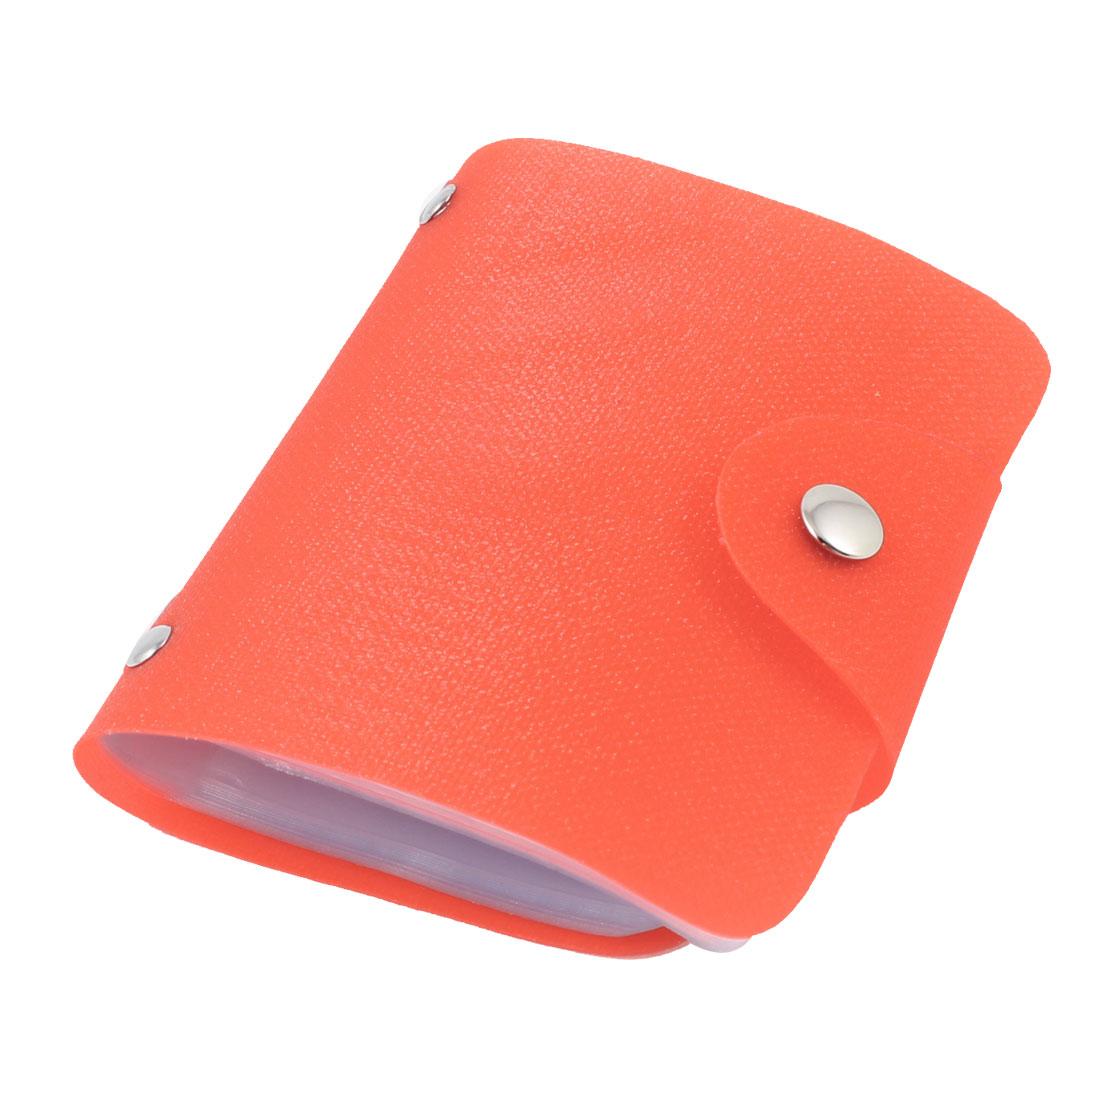 Orange Red Shiny Plastic Press Stud Closure VIP ID Cards 26 Slot Case Holder